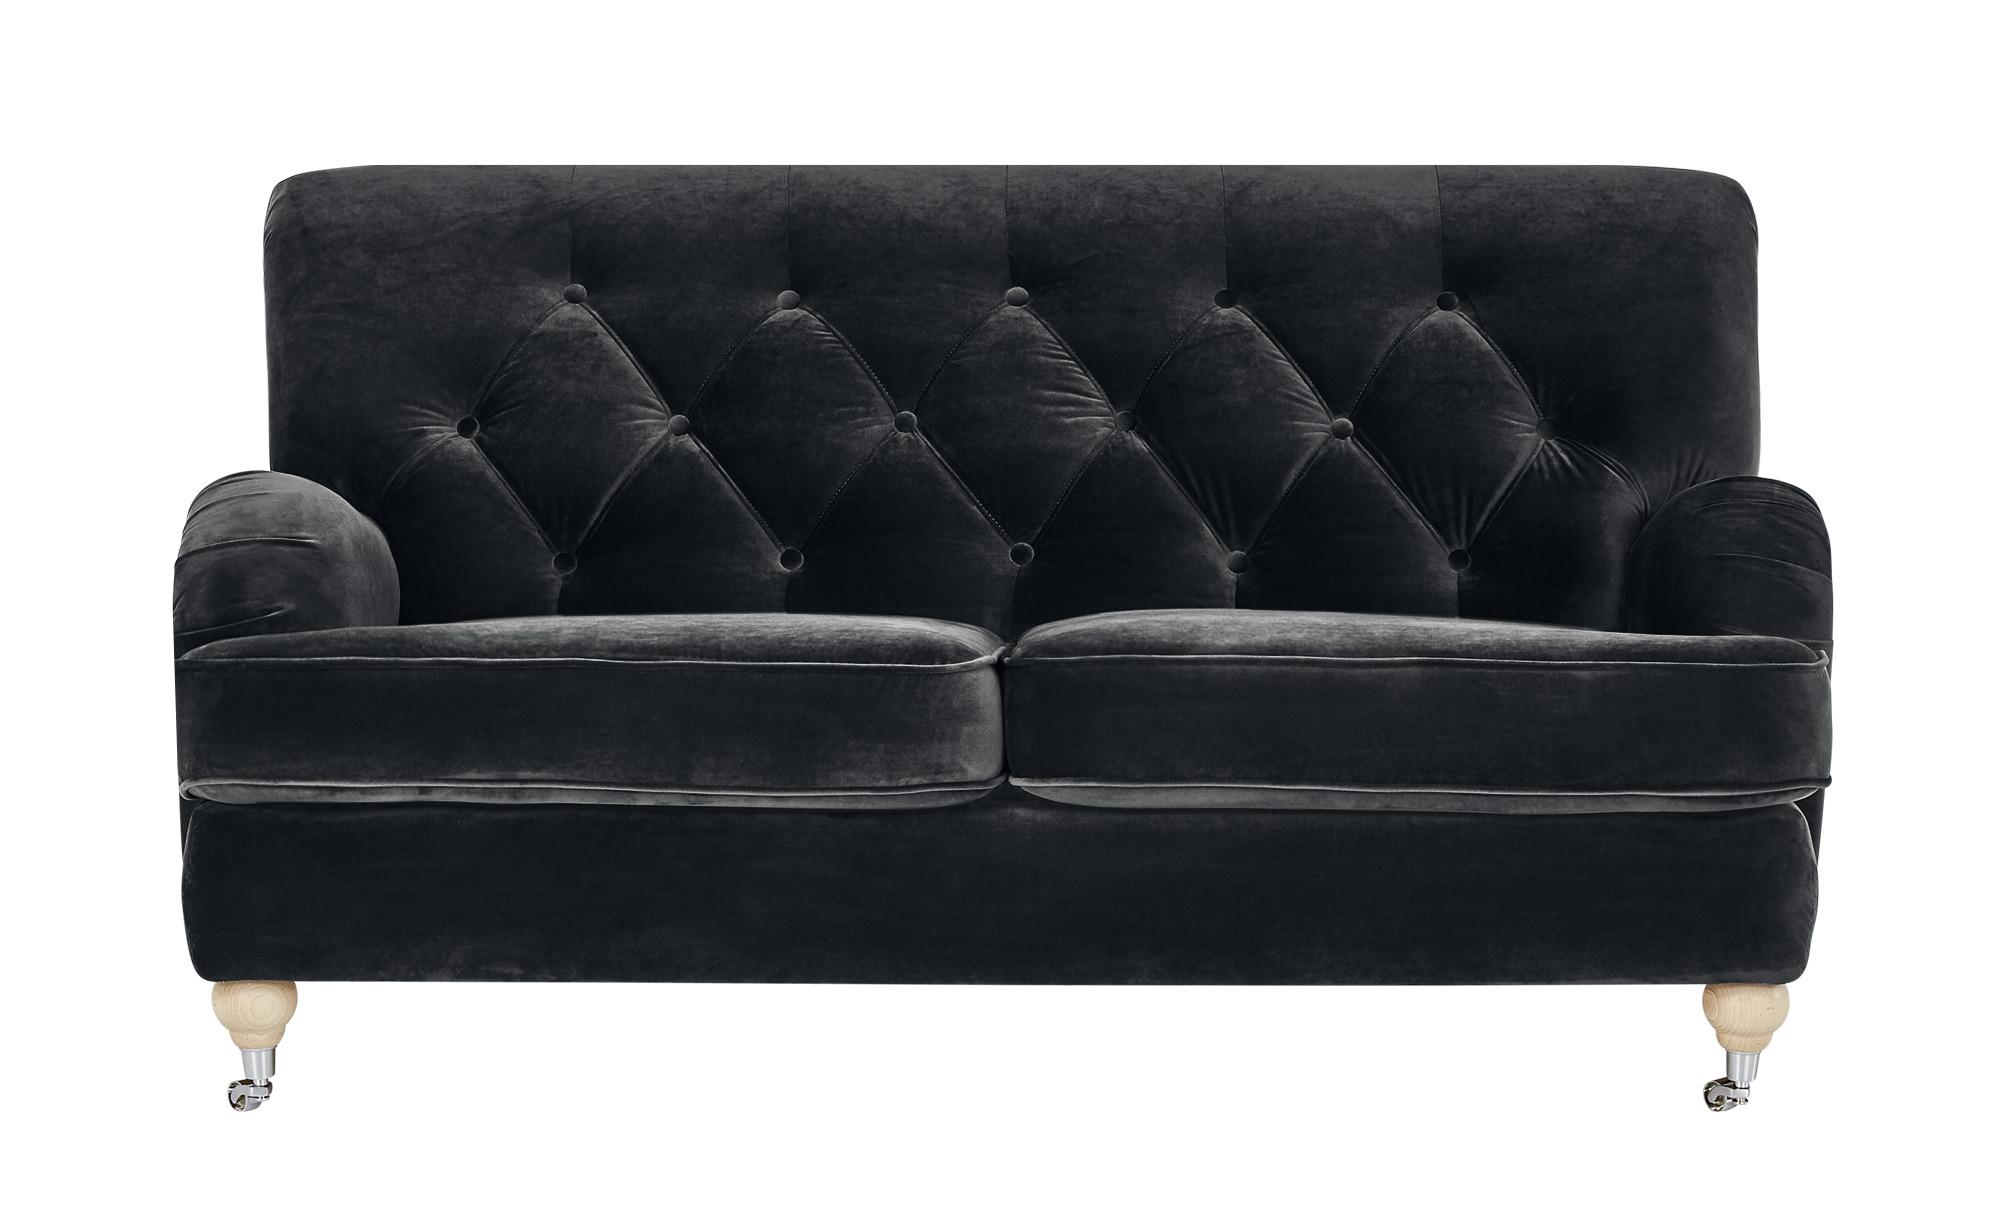 finya Sofa Samt Silva ¦ schwarz ¦ Maße (cm): B: 162 H: 87 T: 104 Polstermöbel > Sofas > 2-Sitzer - Höffner